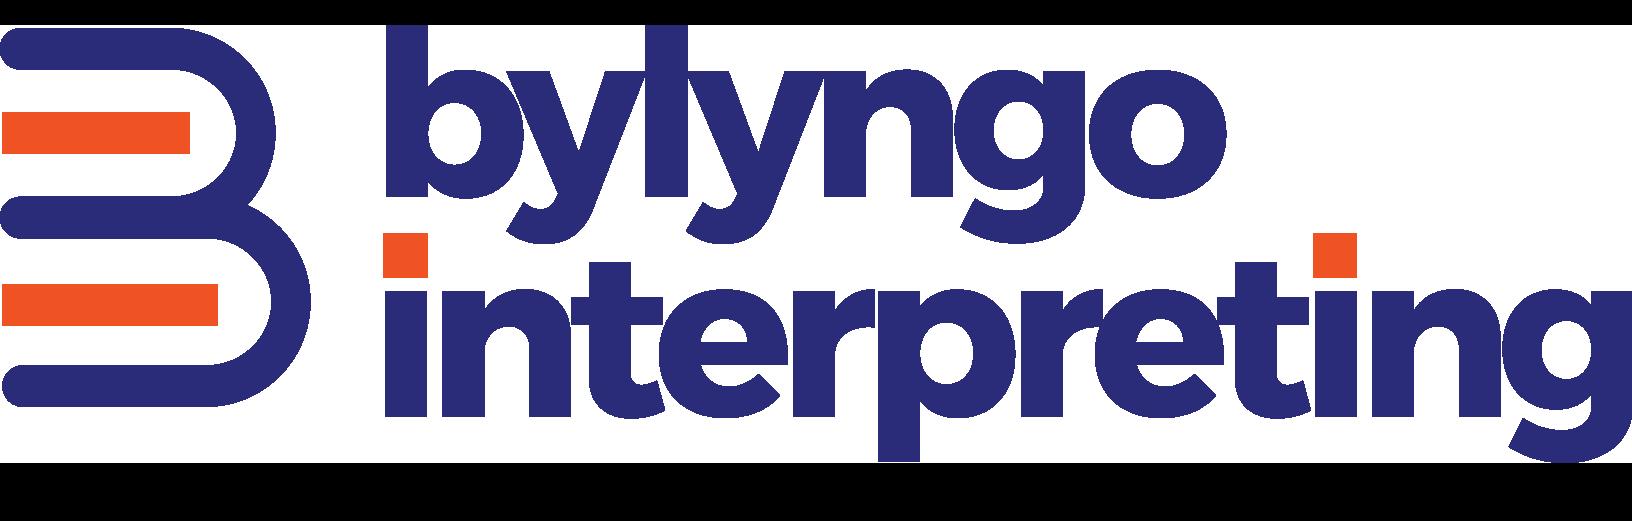 Certified Interpreters And Translators, Milwaukee Certified Translator, On Demand Interpreters - Bylyngo.com